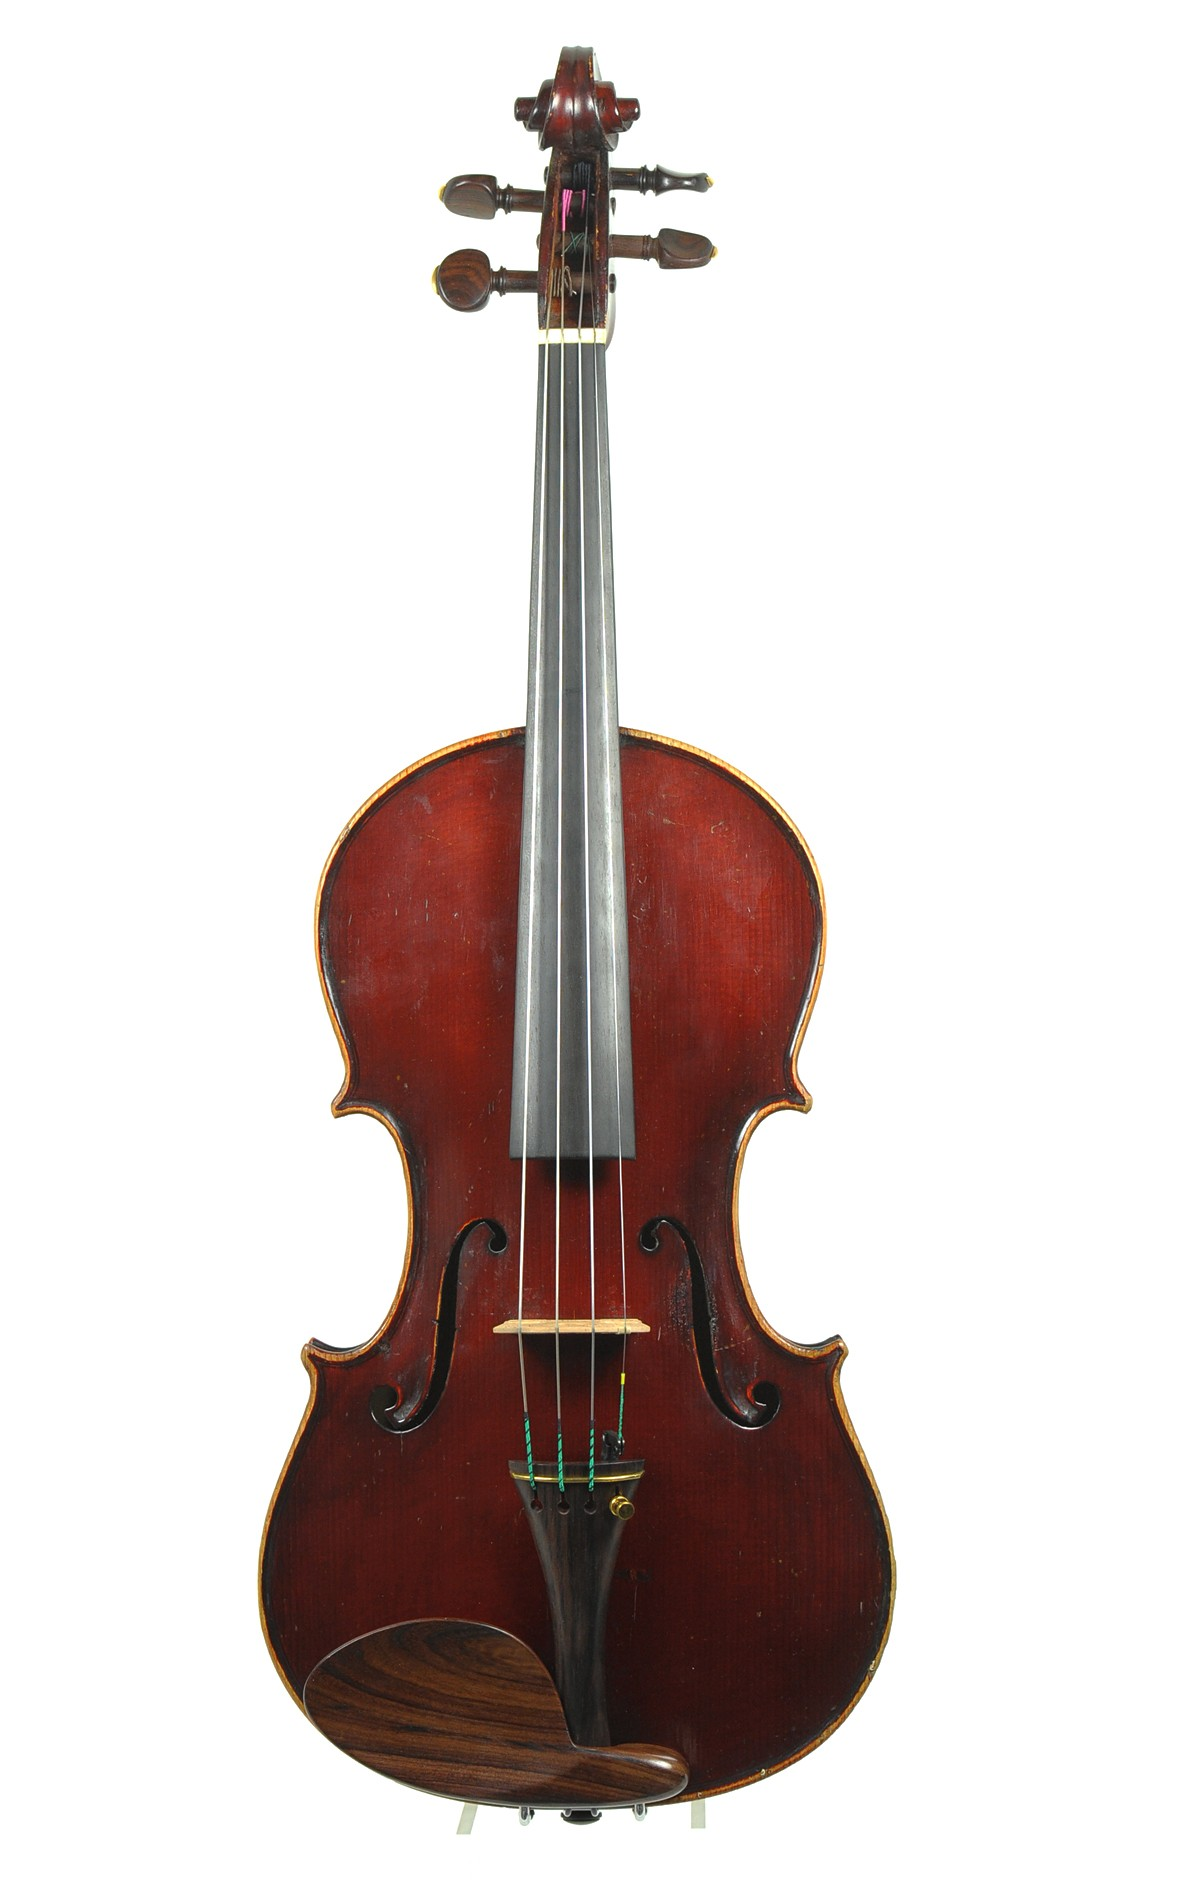 Officina Claudio Monteverde, Cremona, 1923: Italian violin